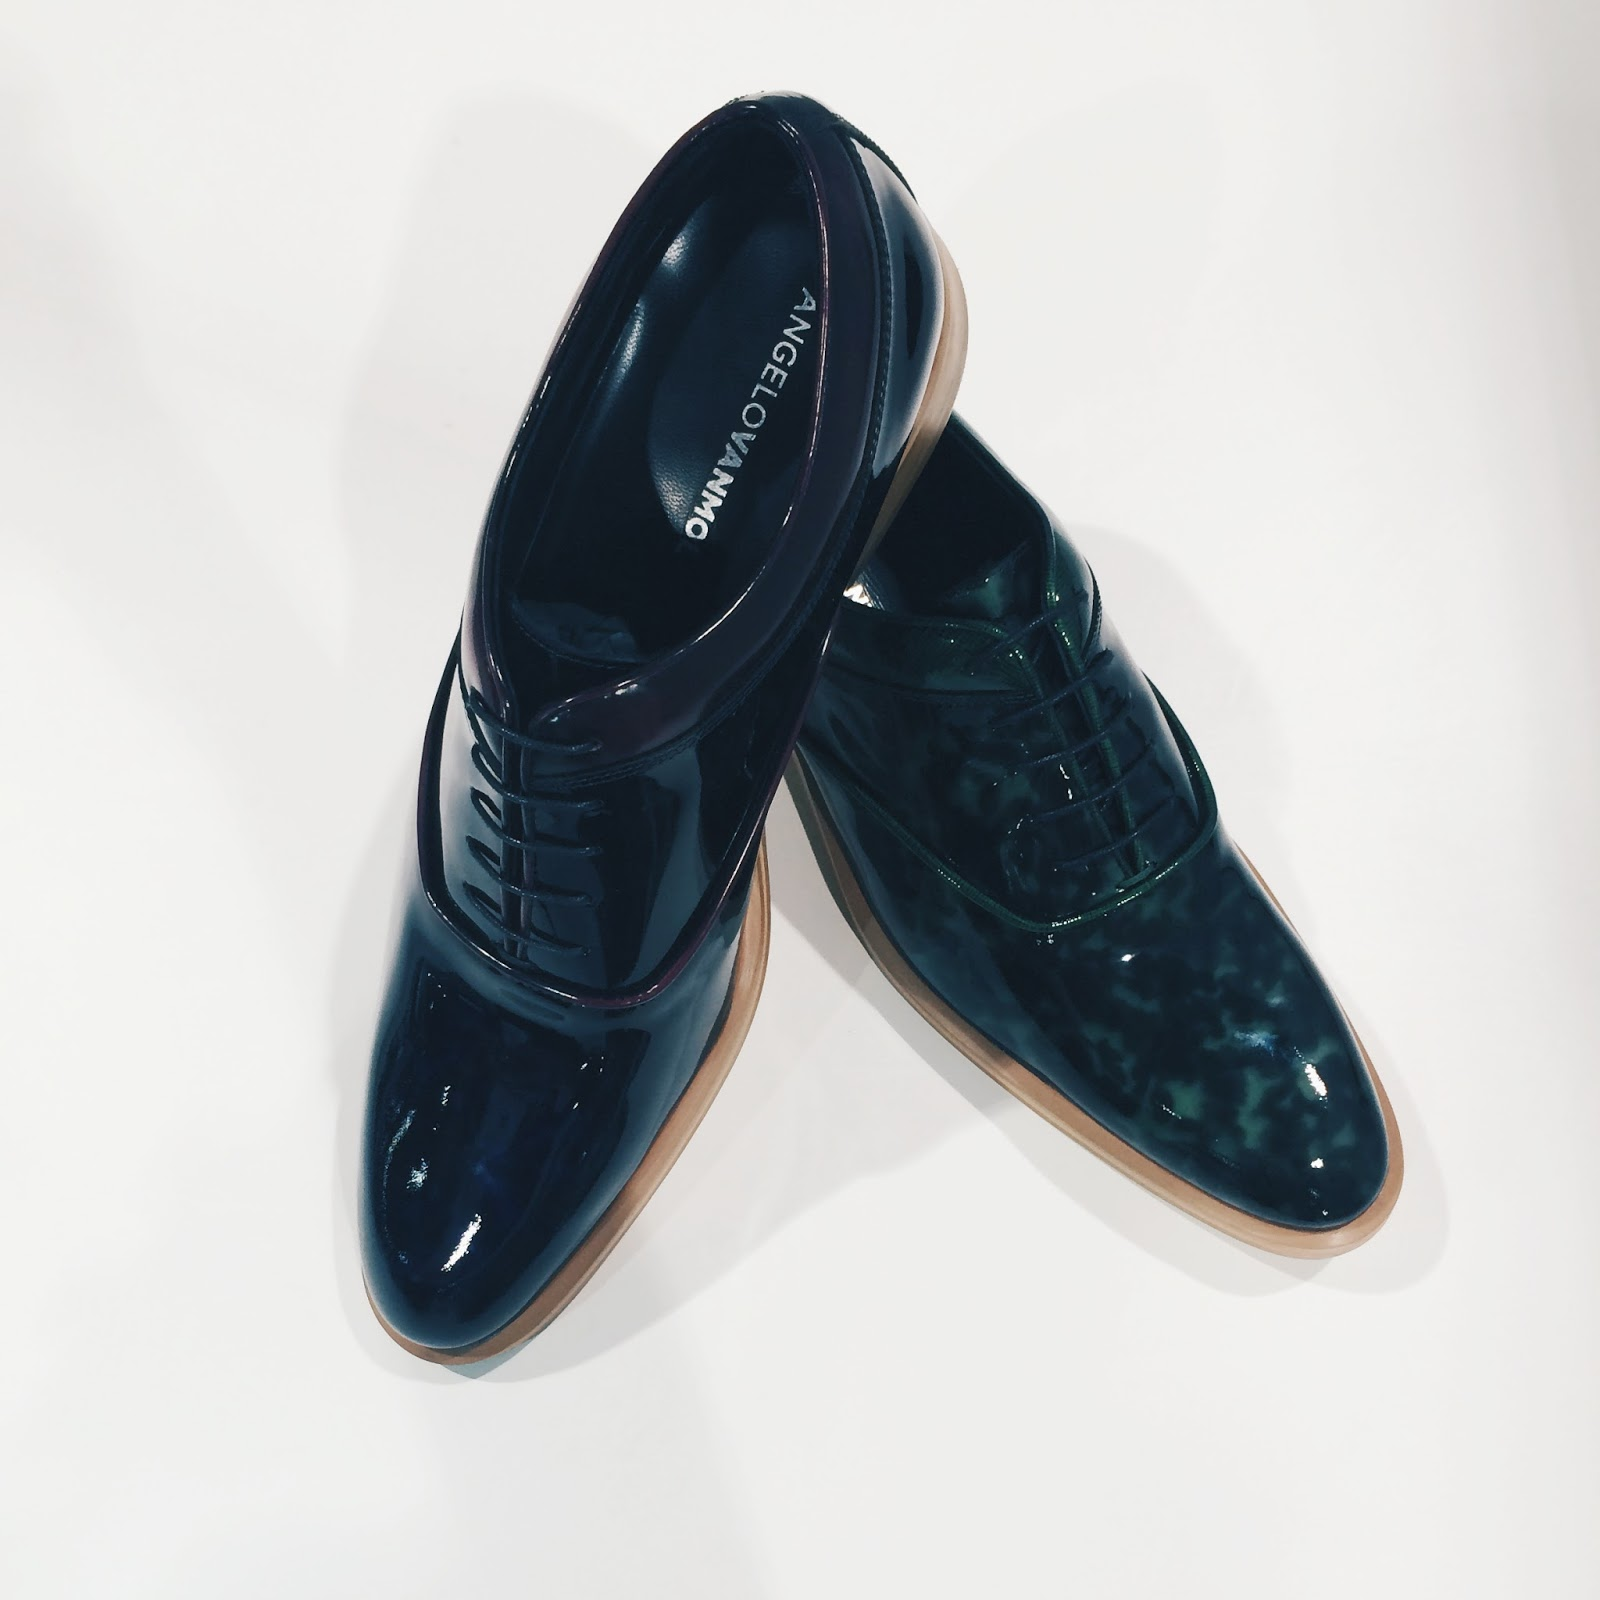 angelo-van-mol-mens-shoes-ss15.jpg